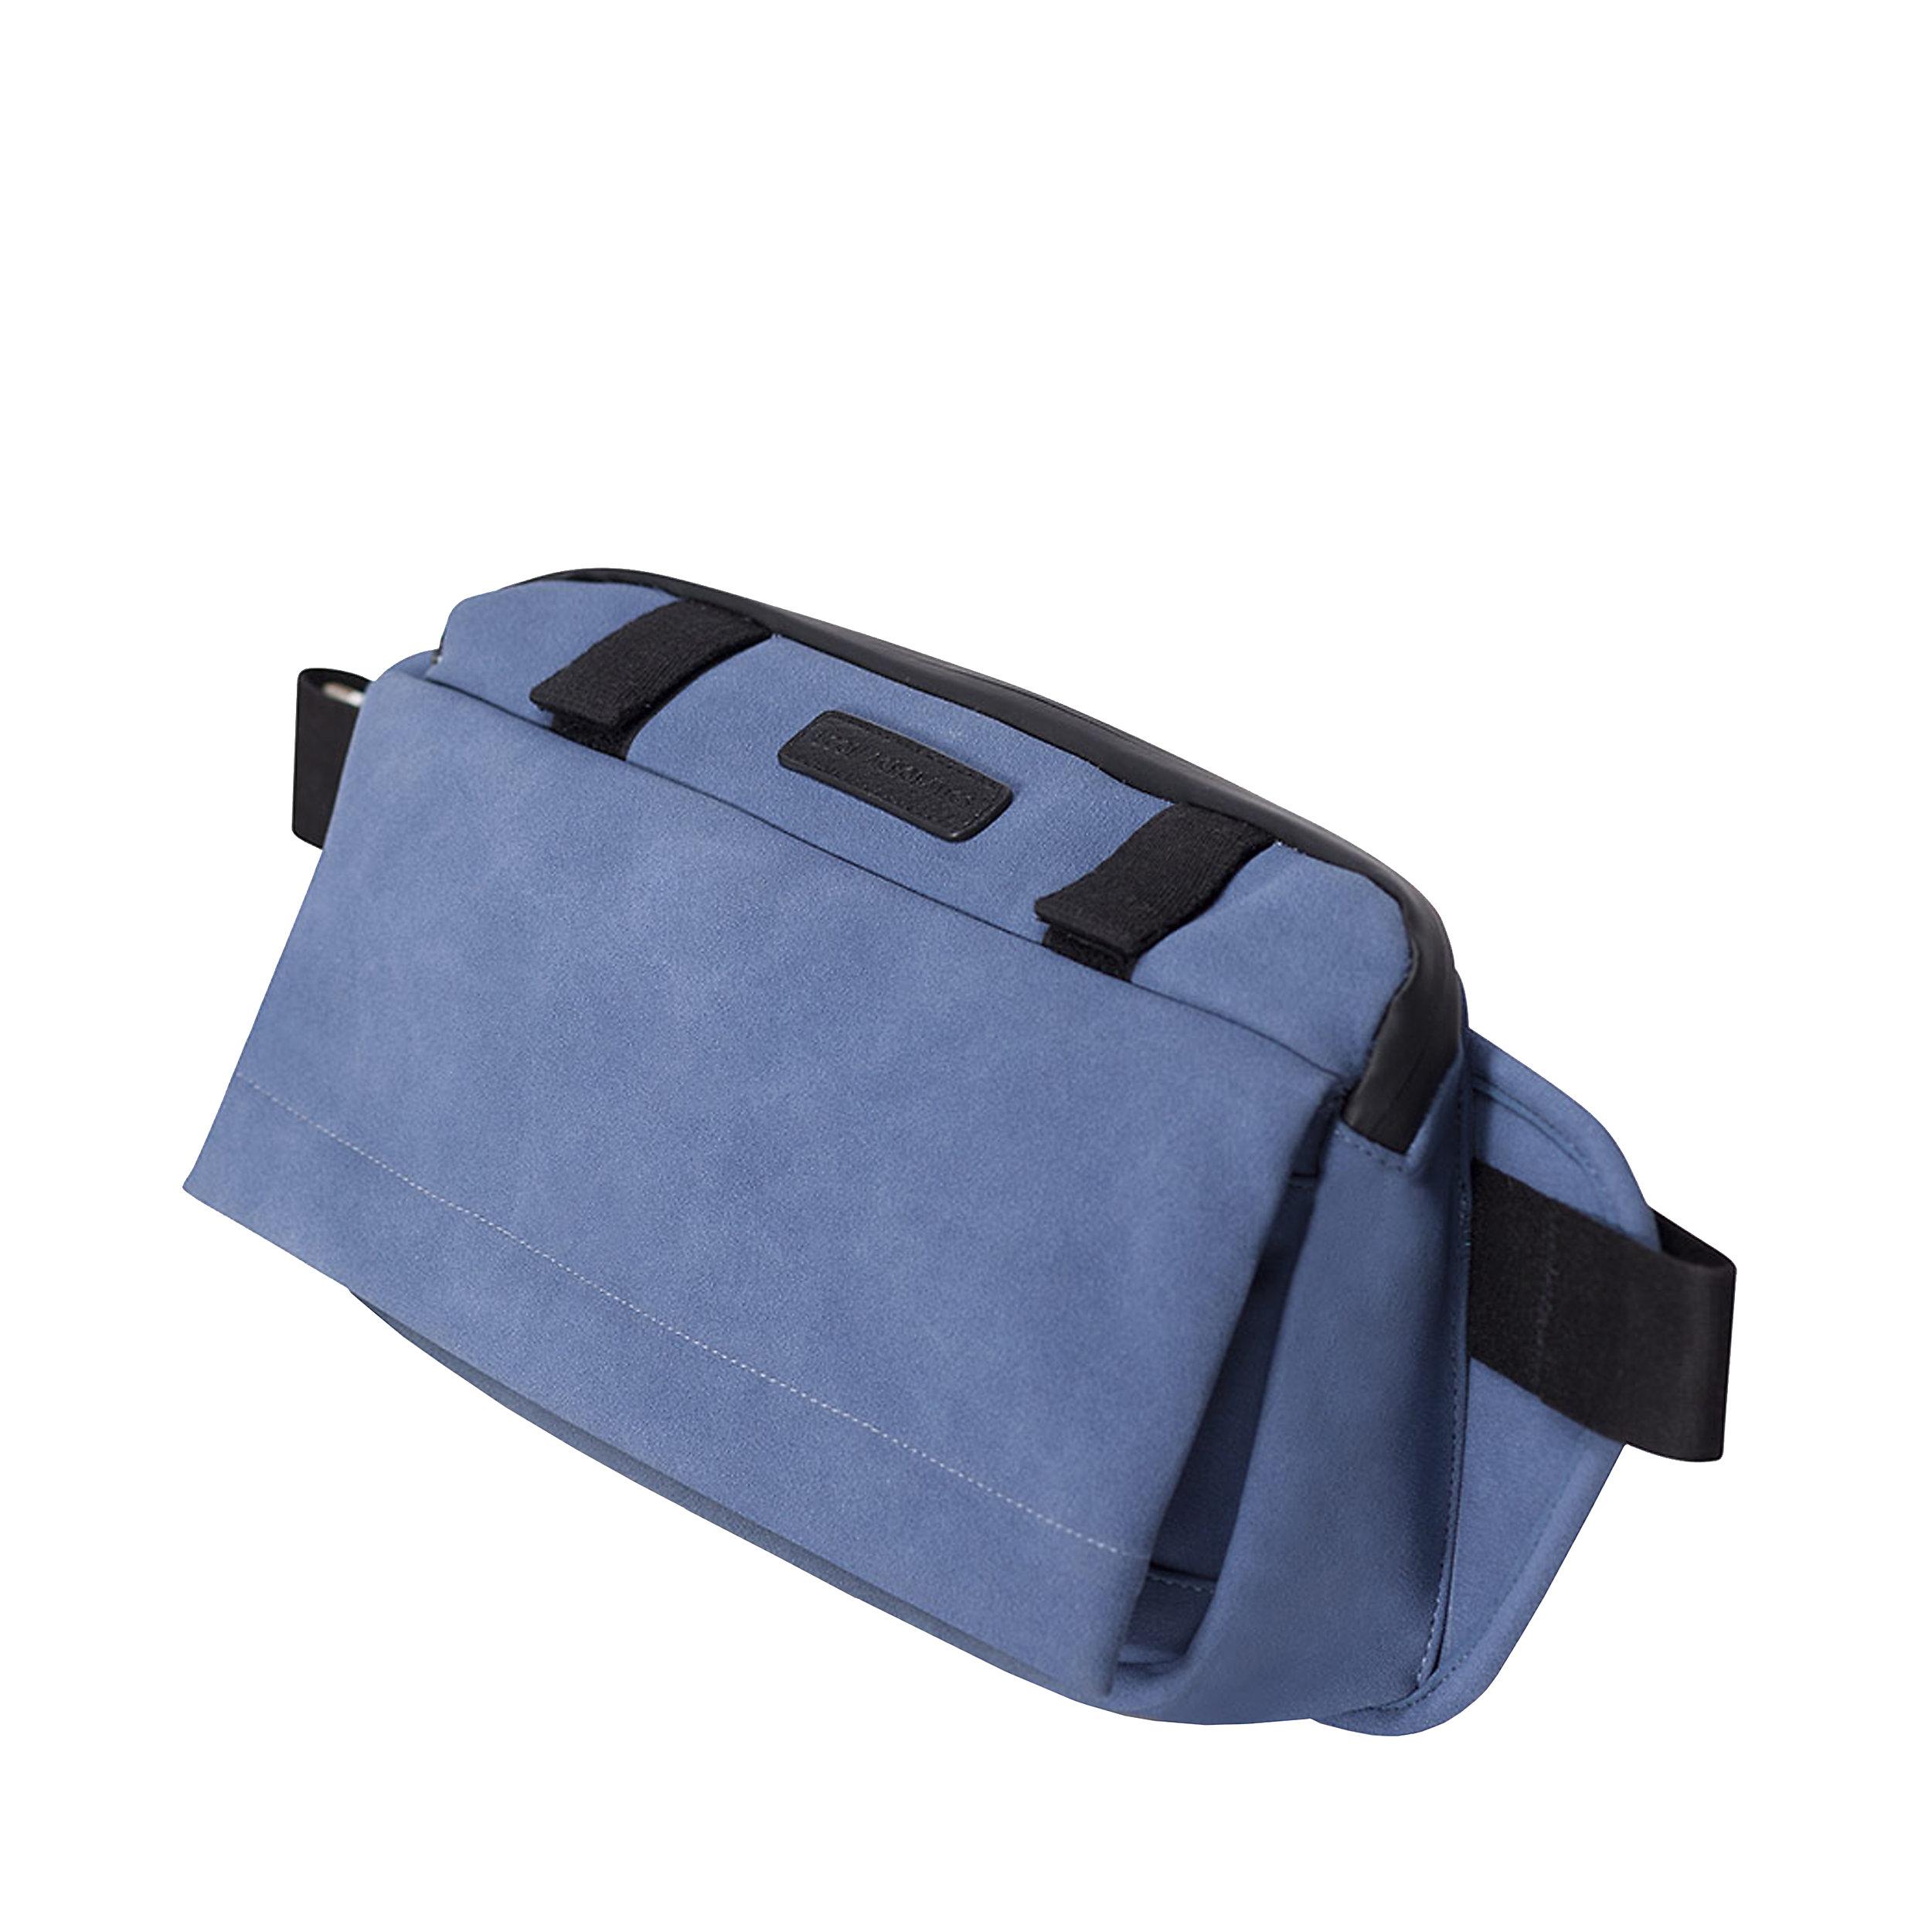 Bum Bag Luca Suede Series 2.5 Liter